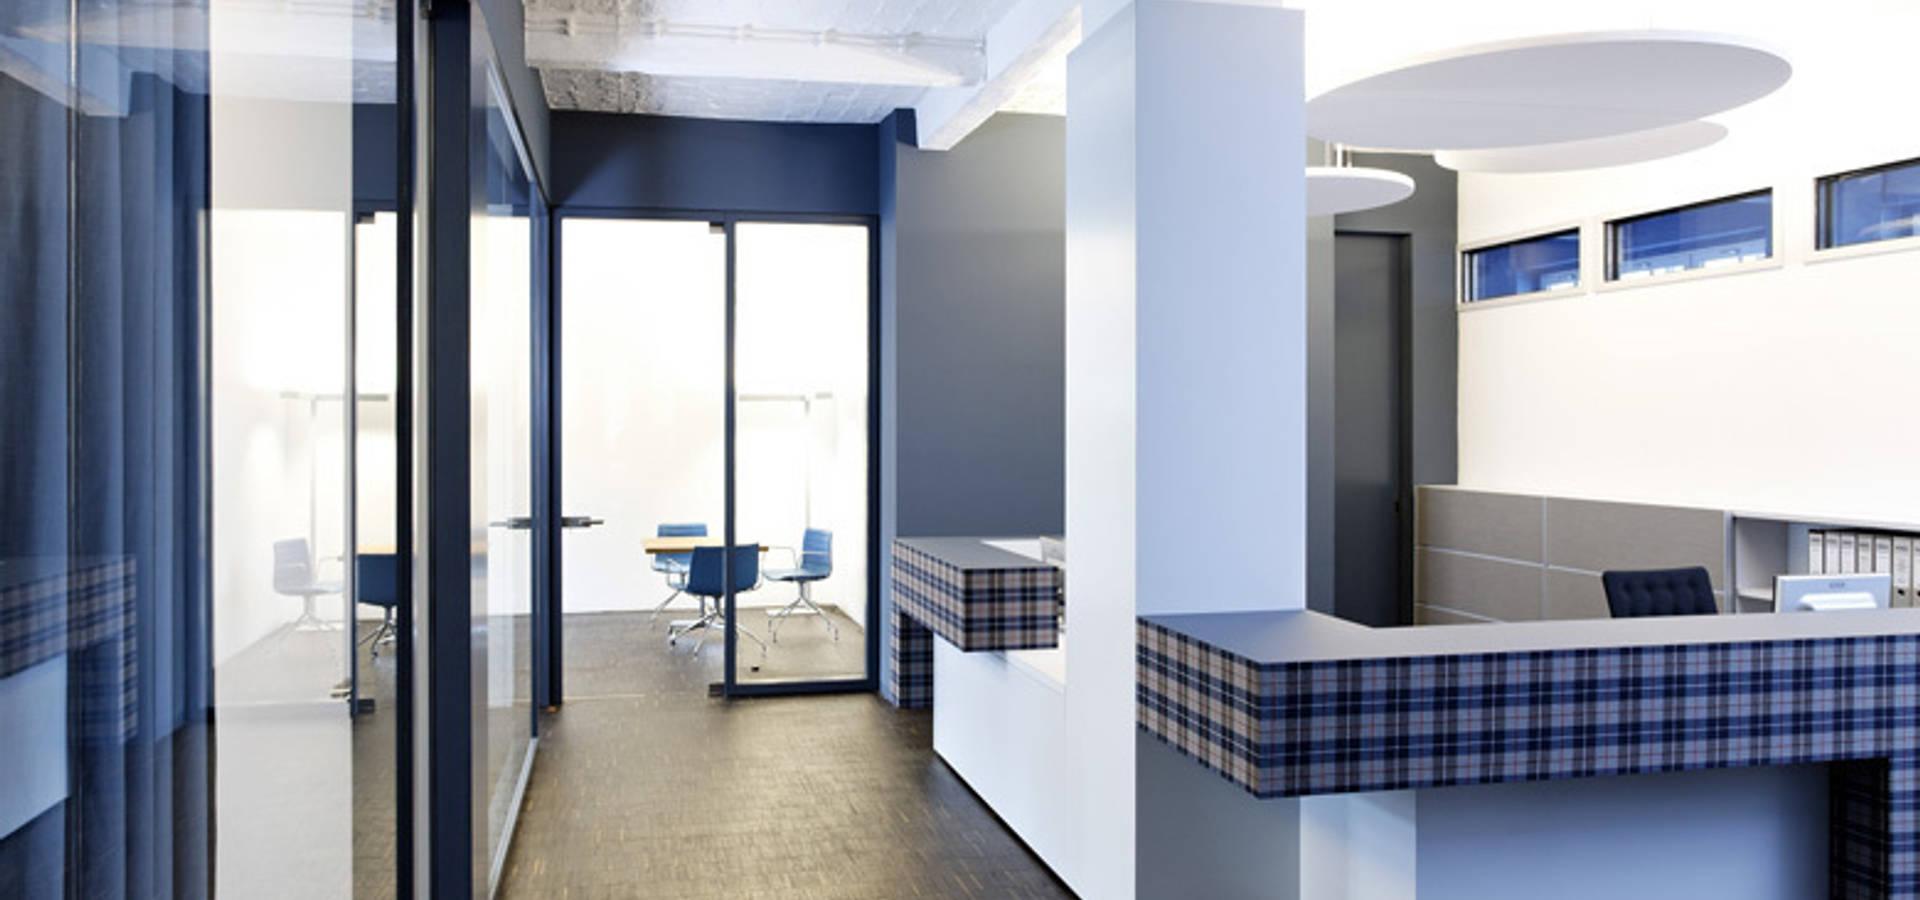 rpu dachgeschoss umbau konferenzr ume por a base i b ro f r architektur homify. Black Bedroom Furniture Sets. Home Design Ideas